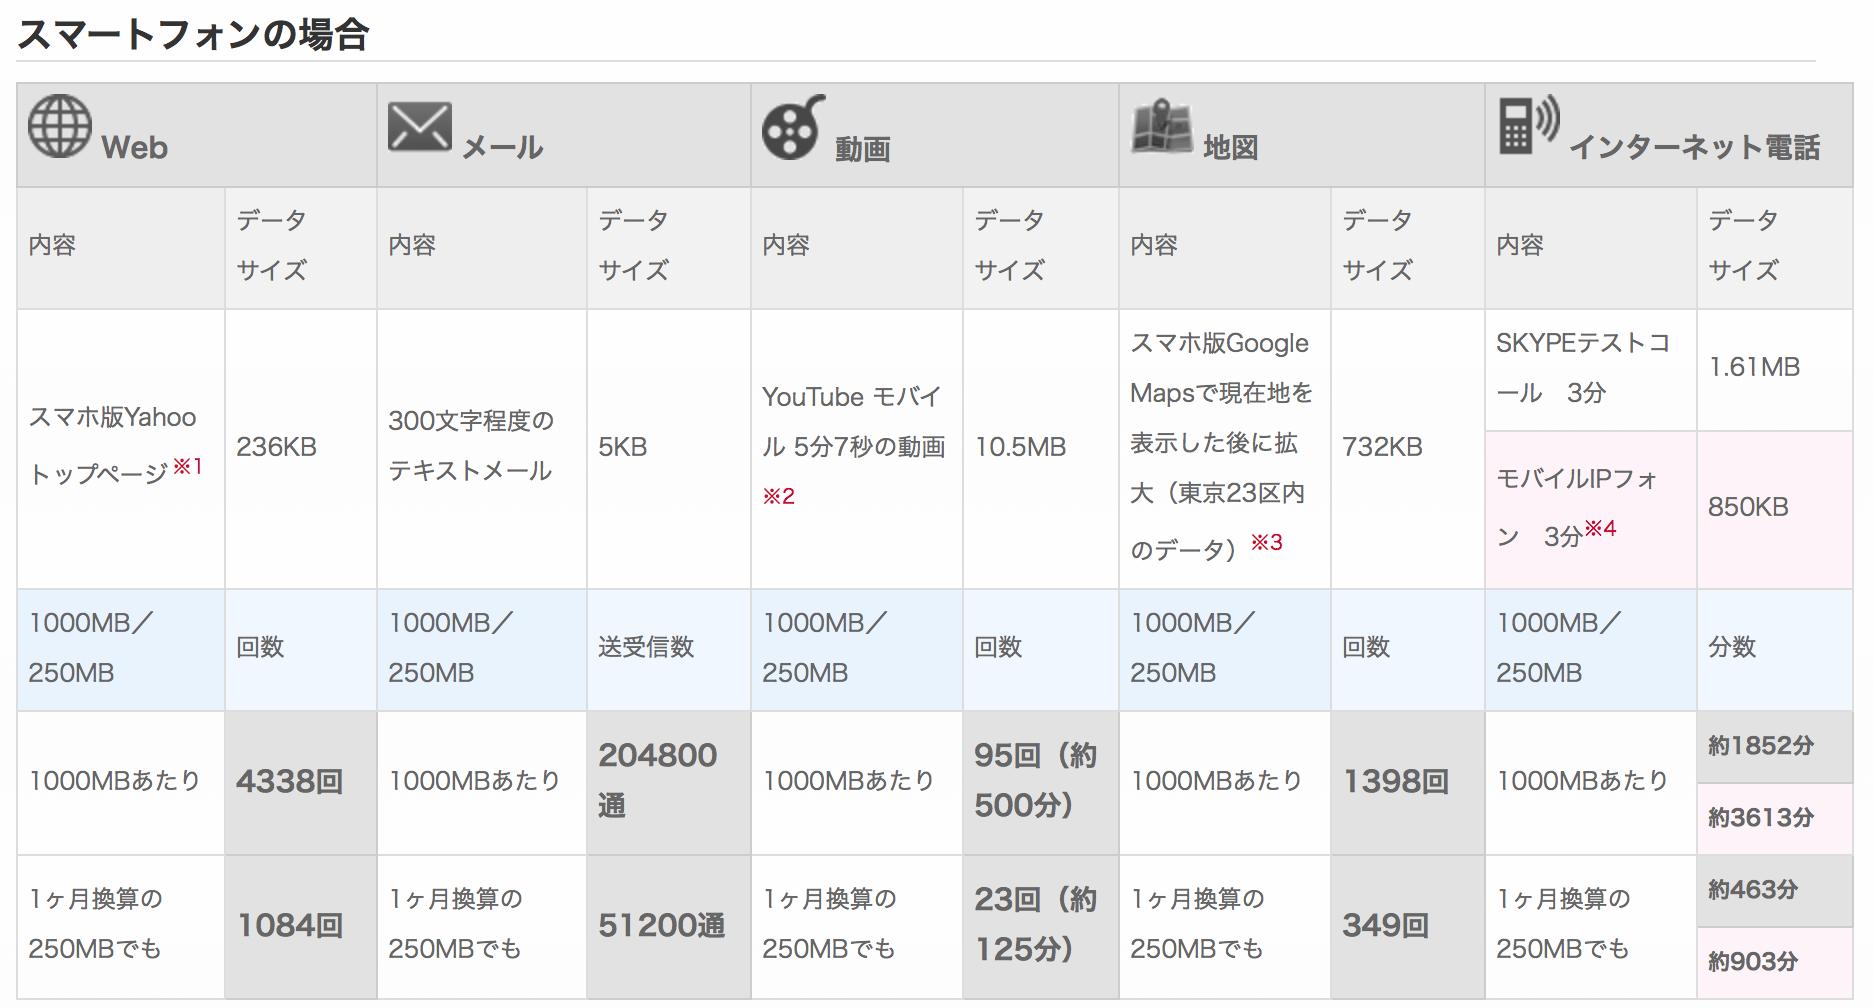 b-mobile1GB